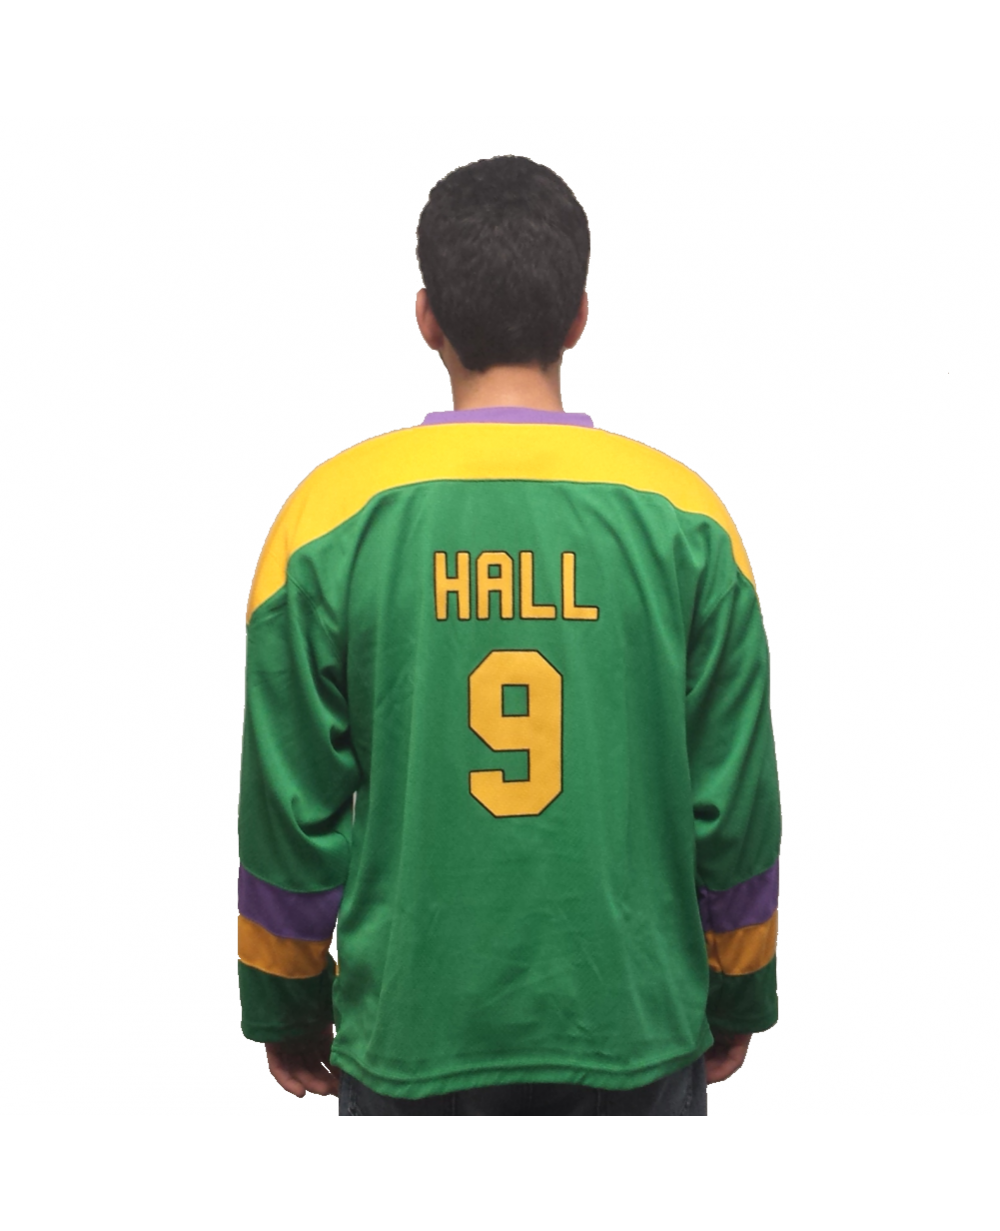 a7f265ca3 More Views. Jesse Hall  9 Ducks Hockey Jersey